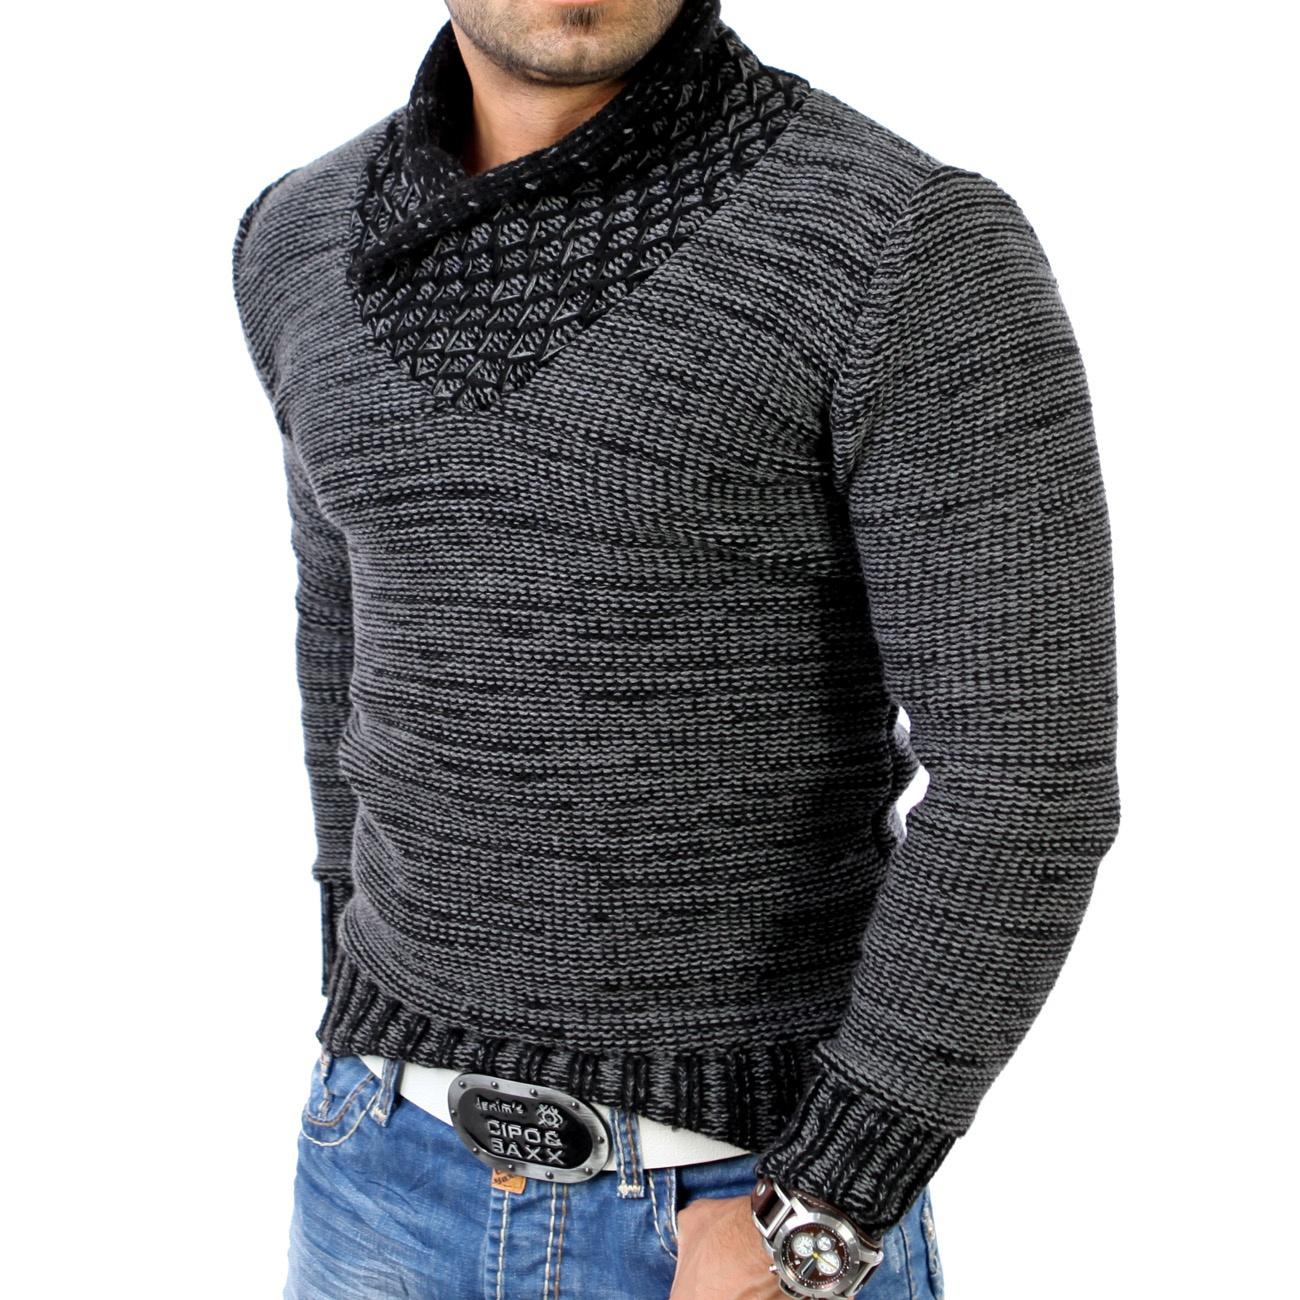 tazzio herren pullover grobstrick sweatshirt strickjacke jacke 3978 anthrazit ebay. Black Bedroom Furniture Sets. Home Design Ideas